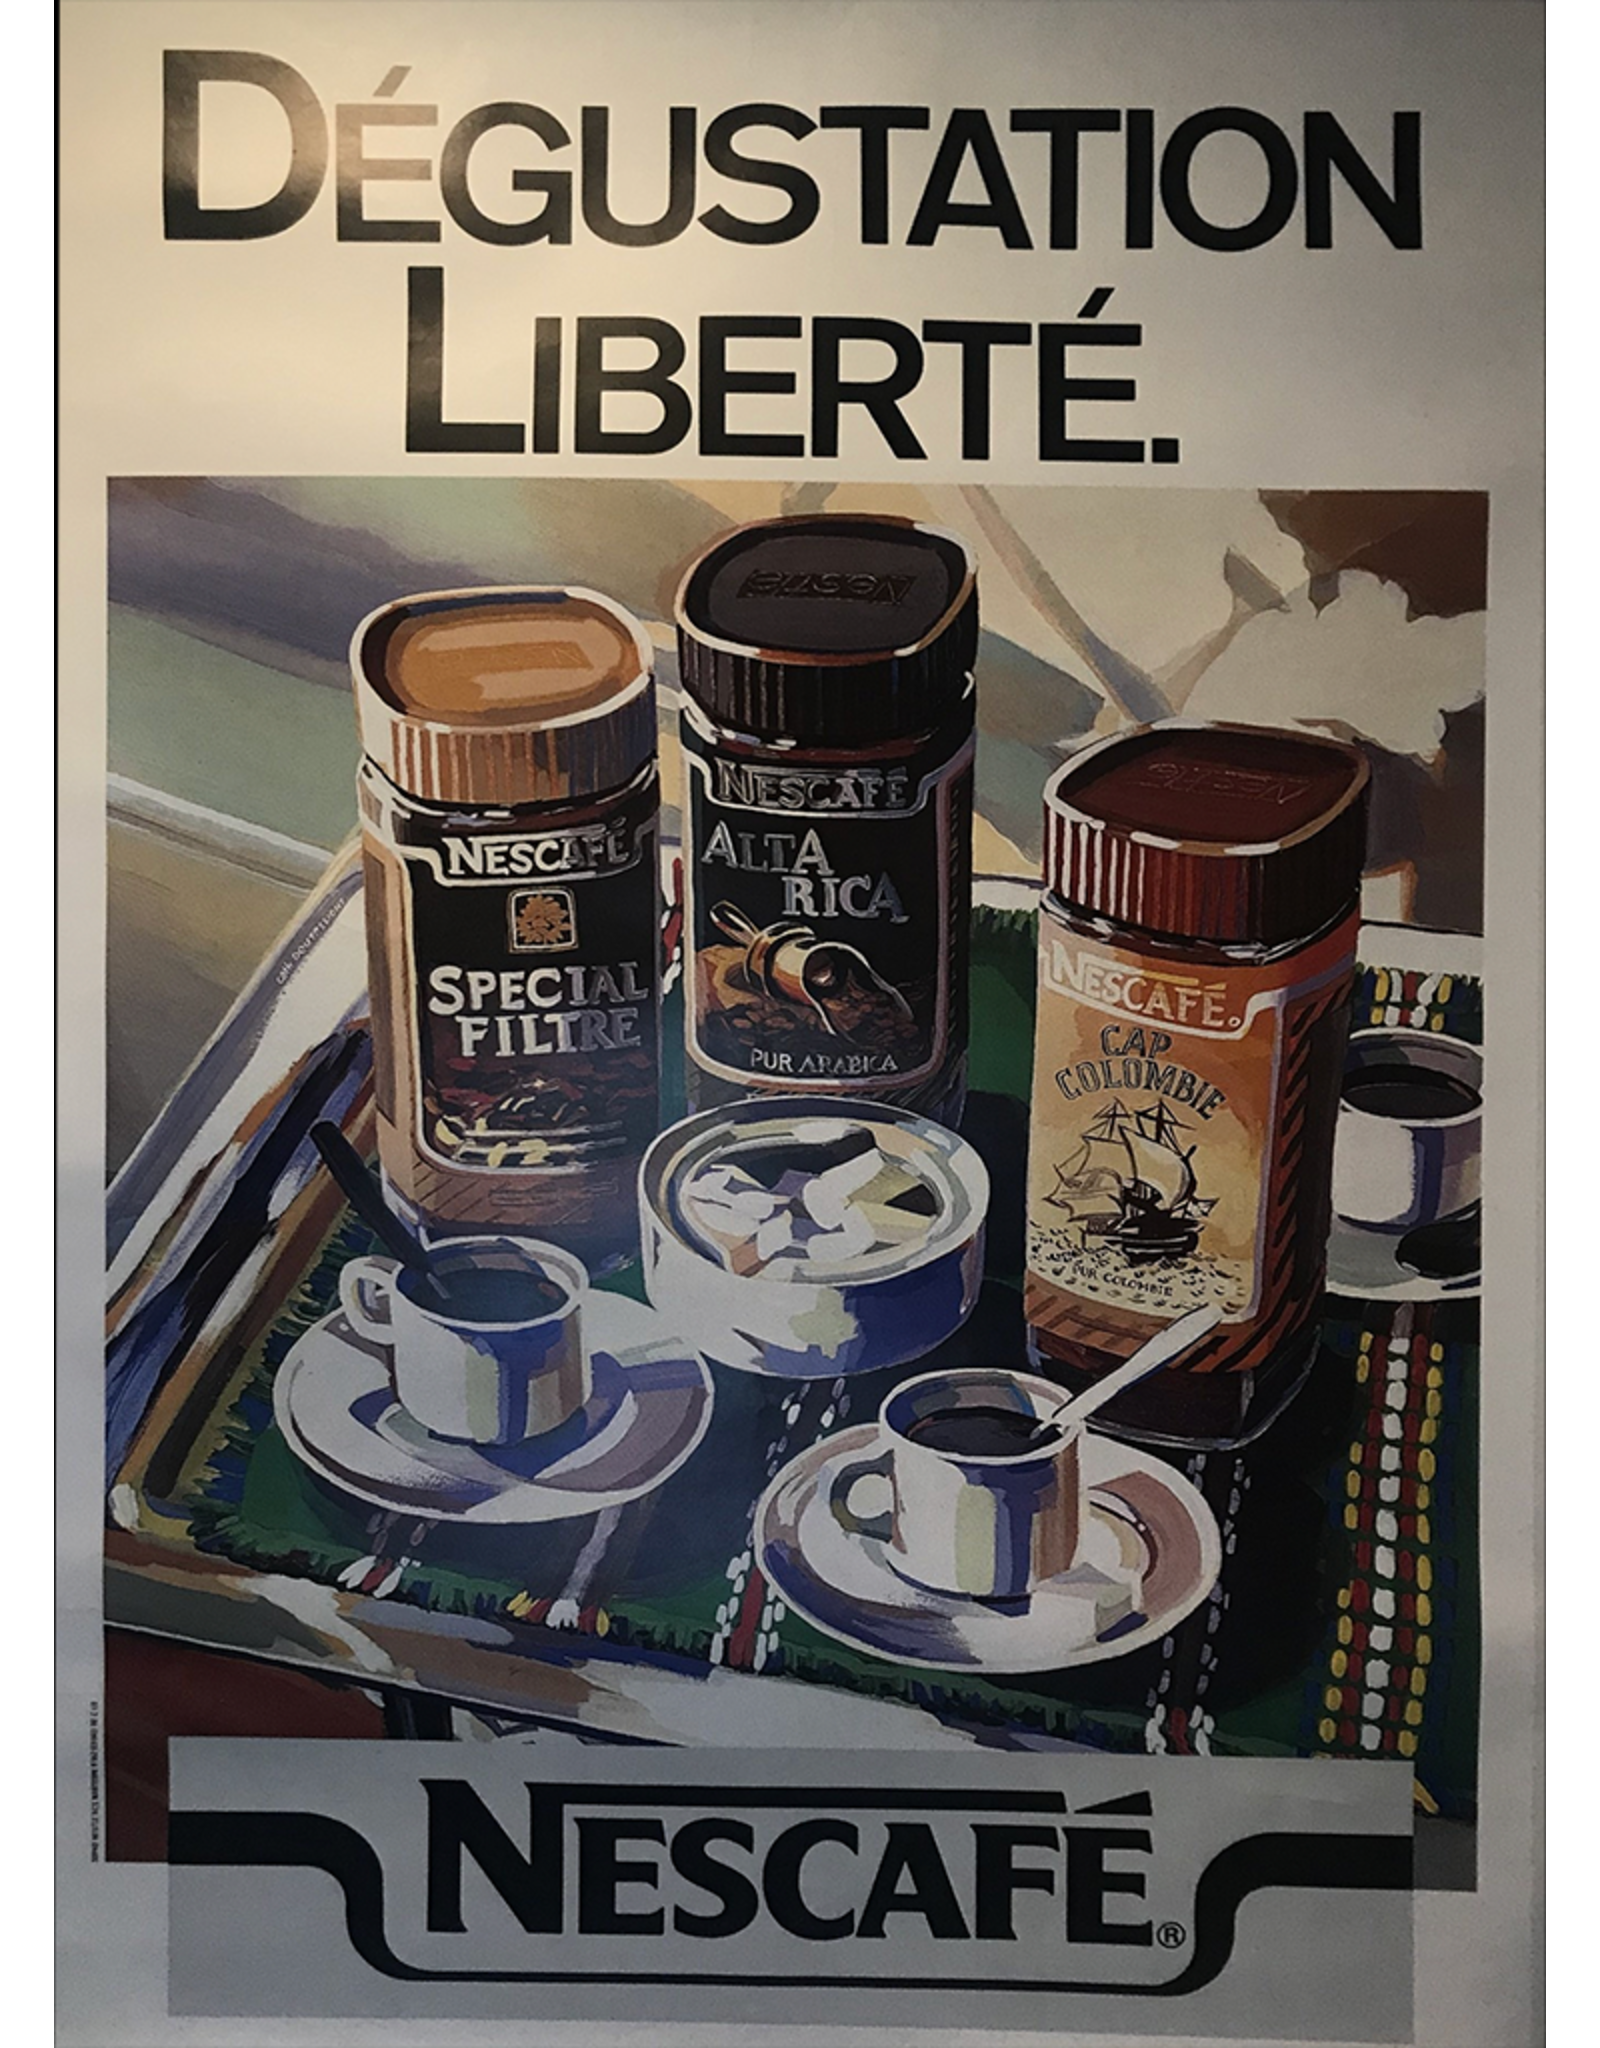 SPV Degustation Liberte Nescafé